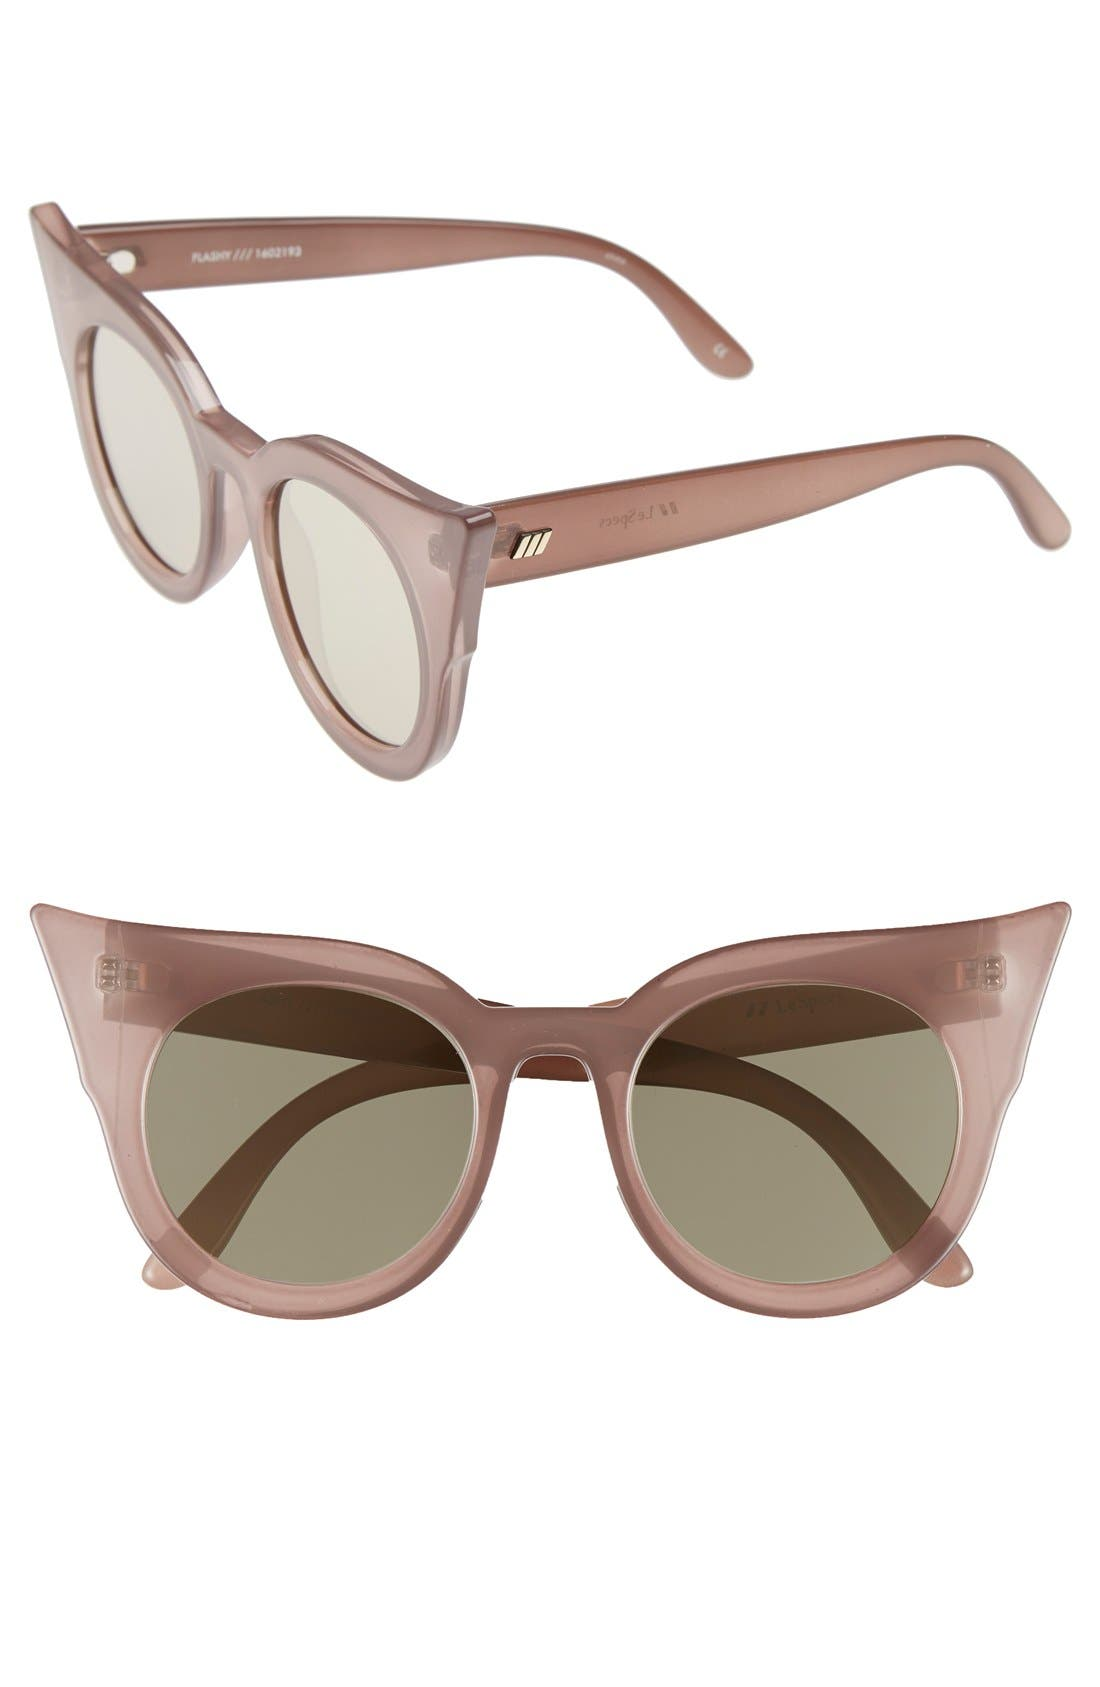 Le Specs 'Flashy' 51mm Sunglasses